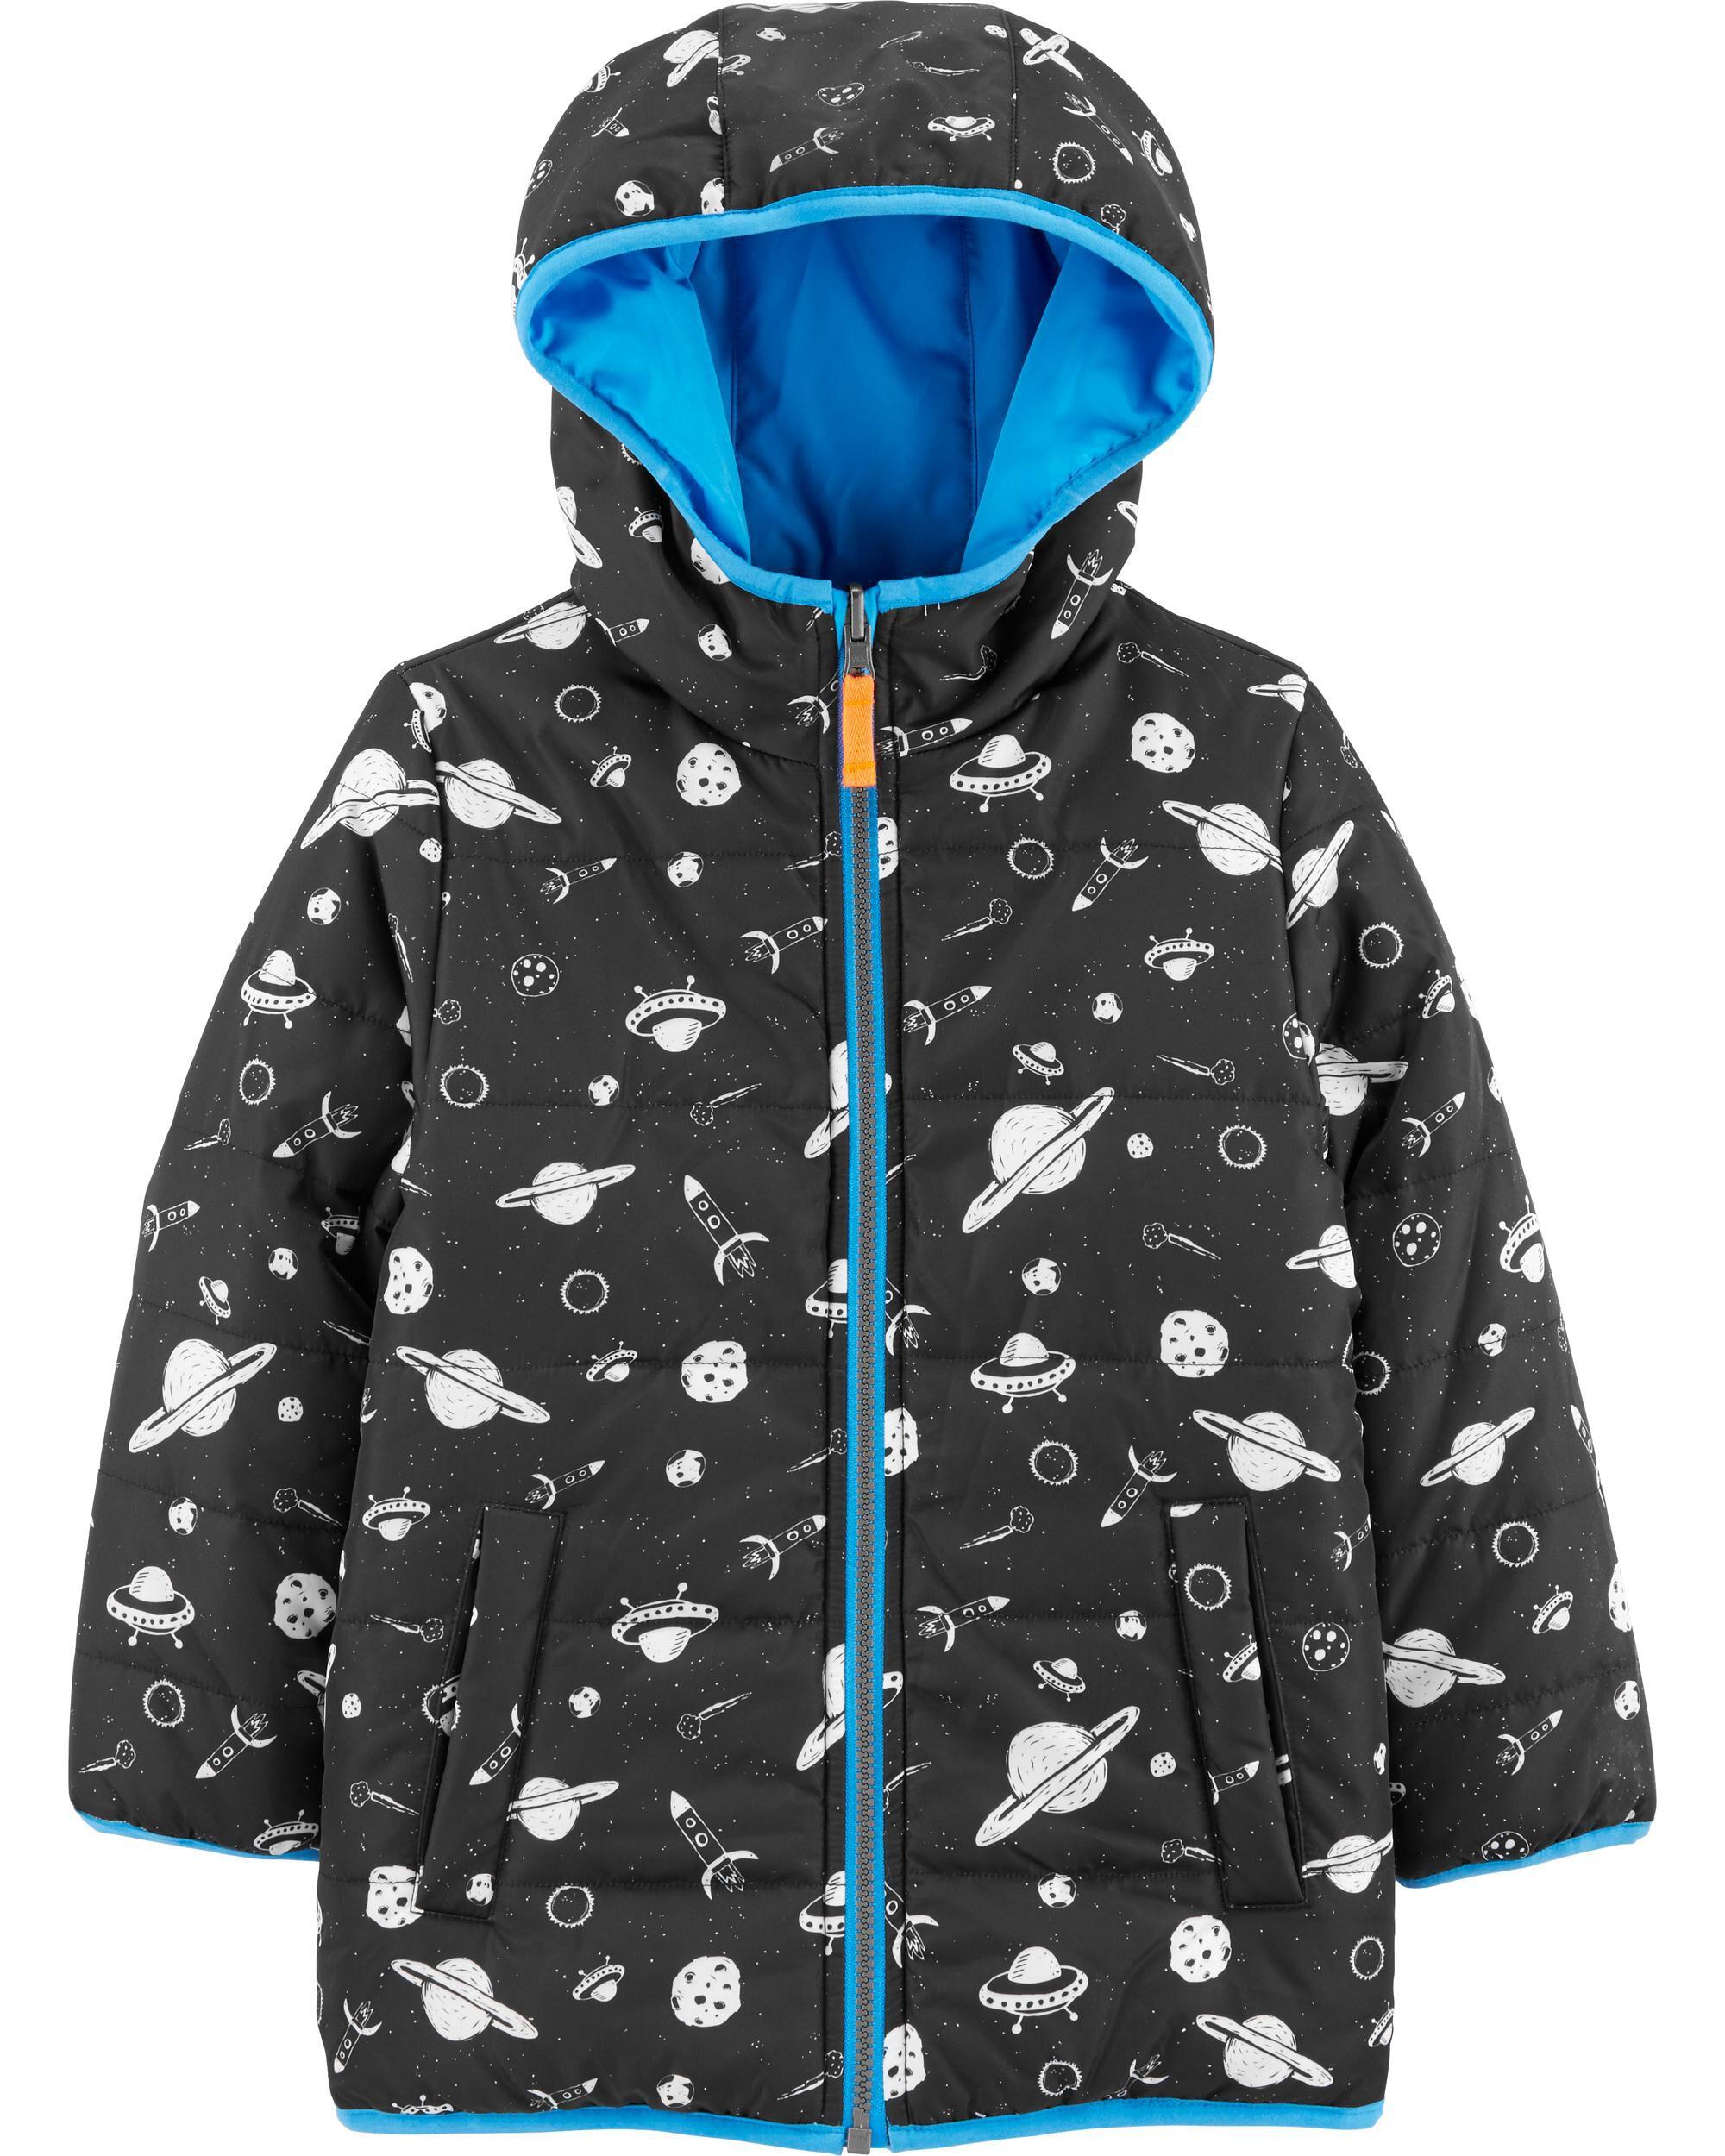 Osh Kosh B/'gosh Infant Girls Space Print Fleece Lined Jacket Size 12M 18M 24M